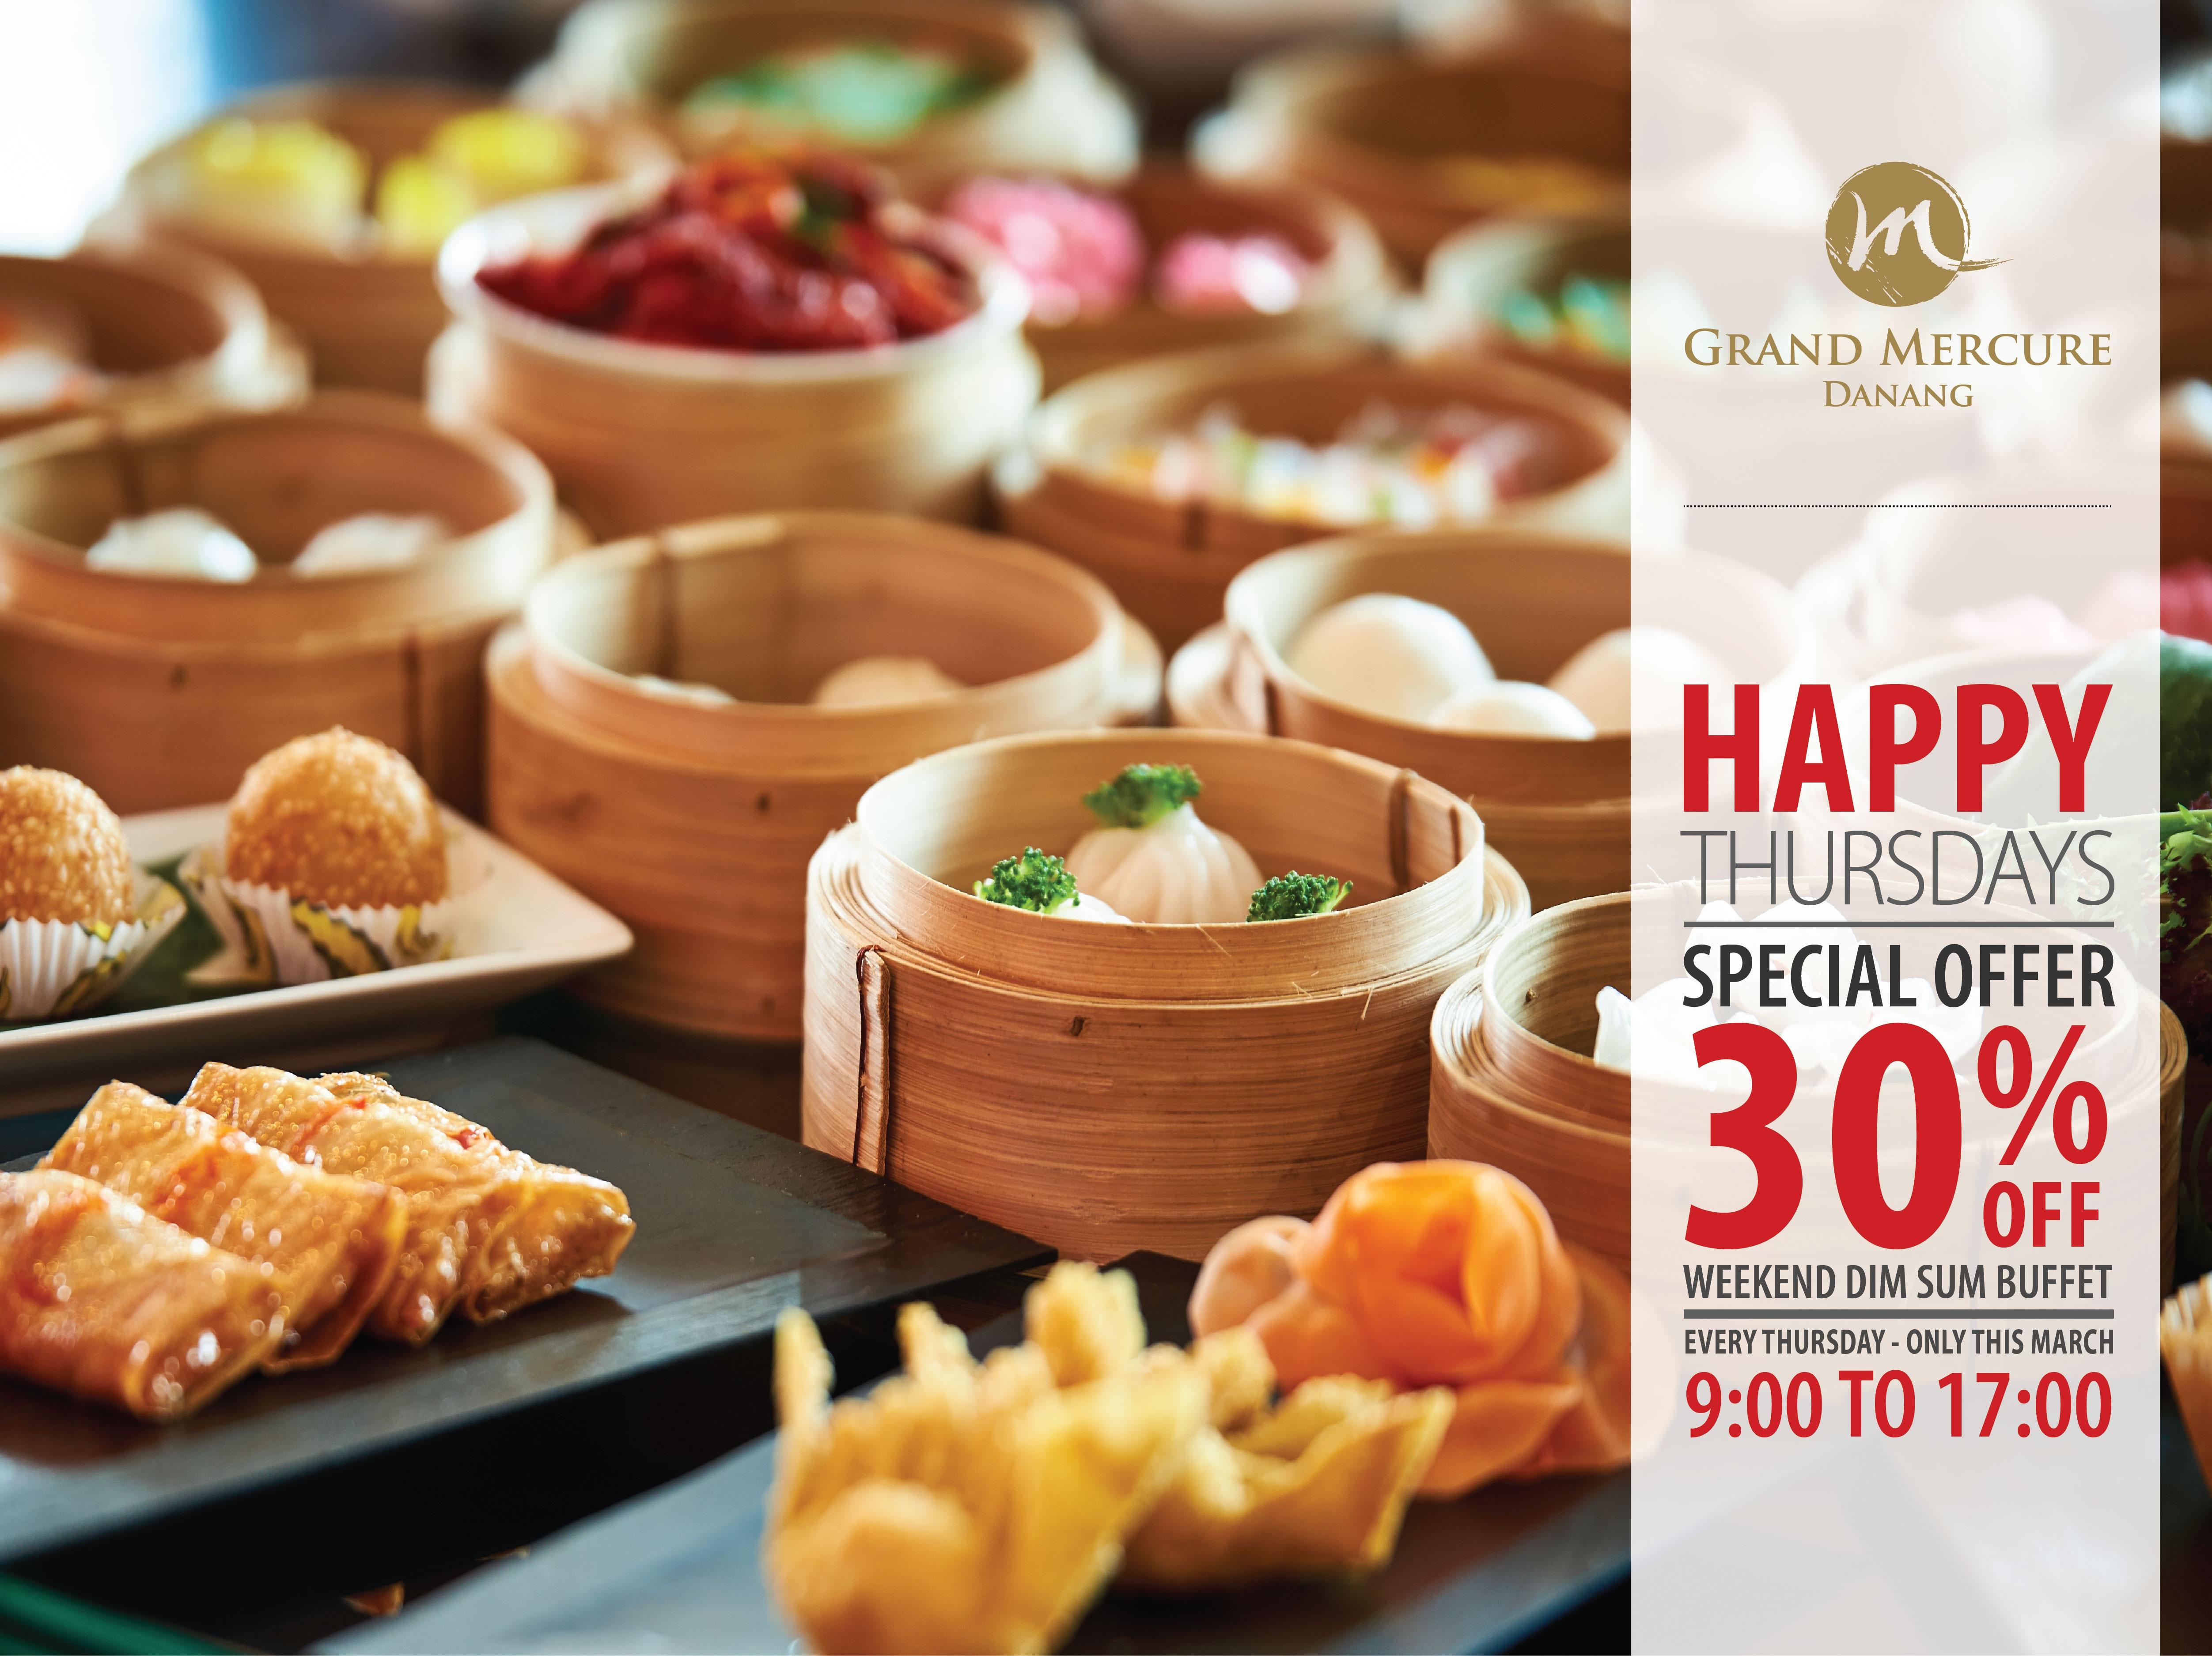 Weekend Dim Sum Buffet - Grand Mercure Danang